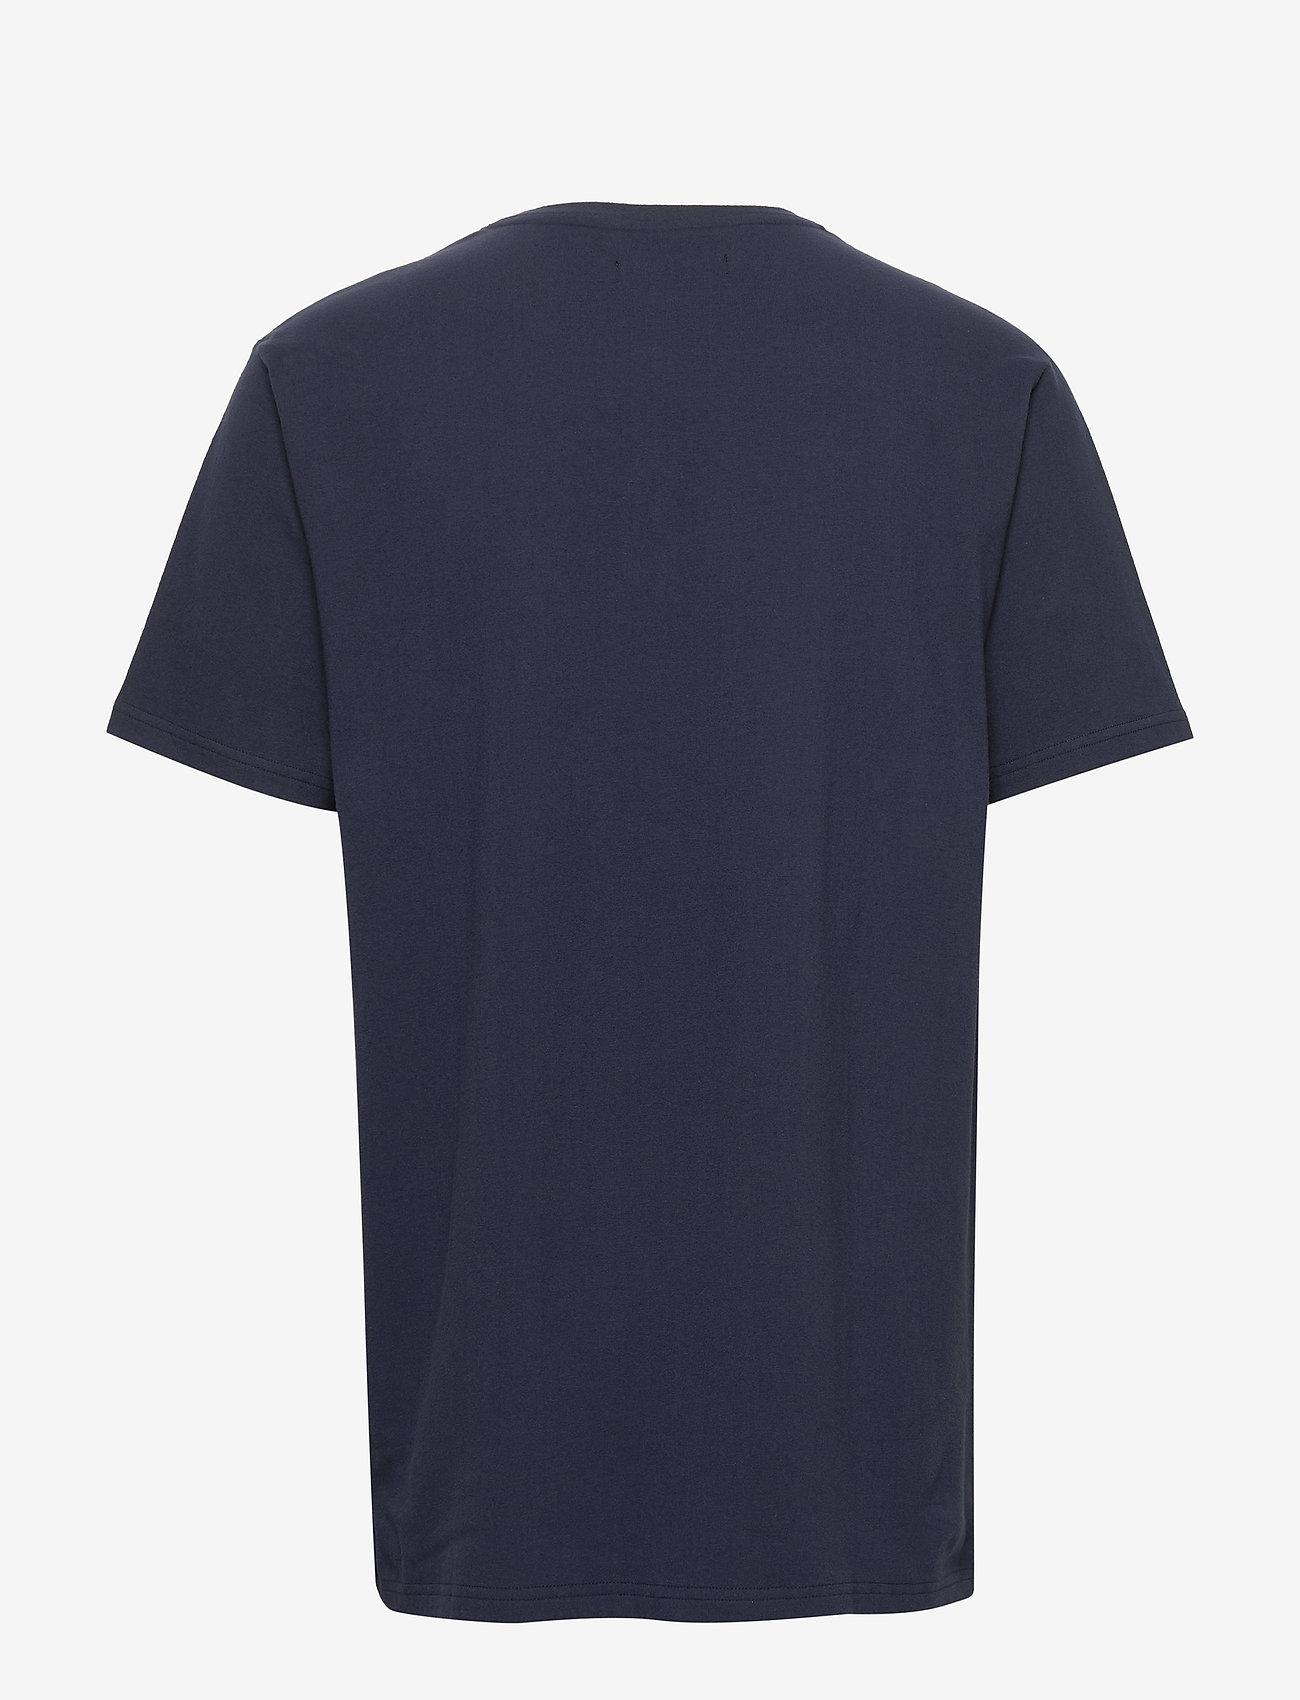 Tommy Hilfiger - HENLEY SS TEE CREST - basic t-shirts - navy blazer - 1